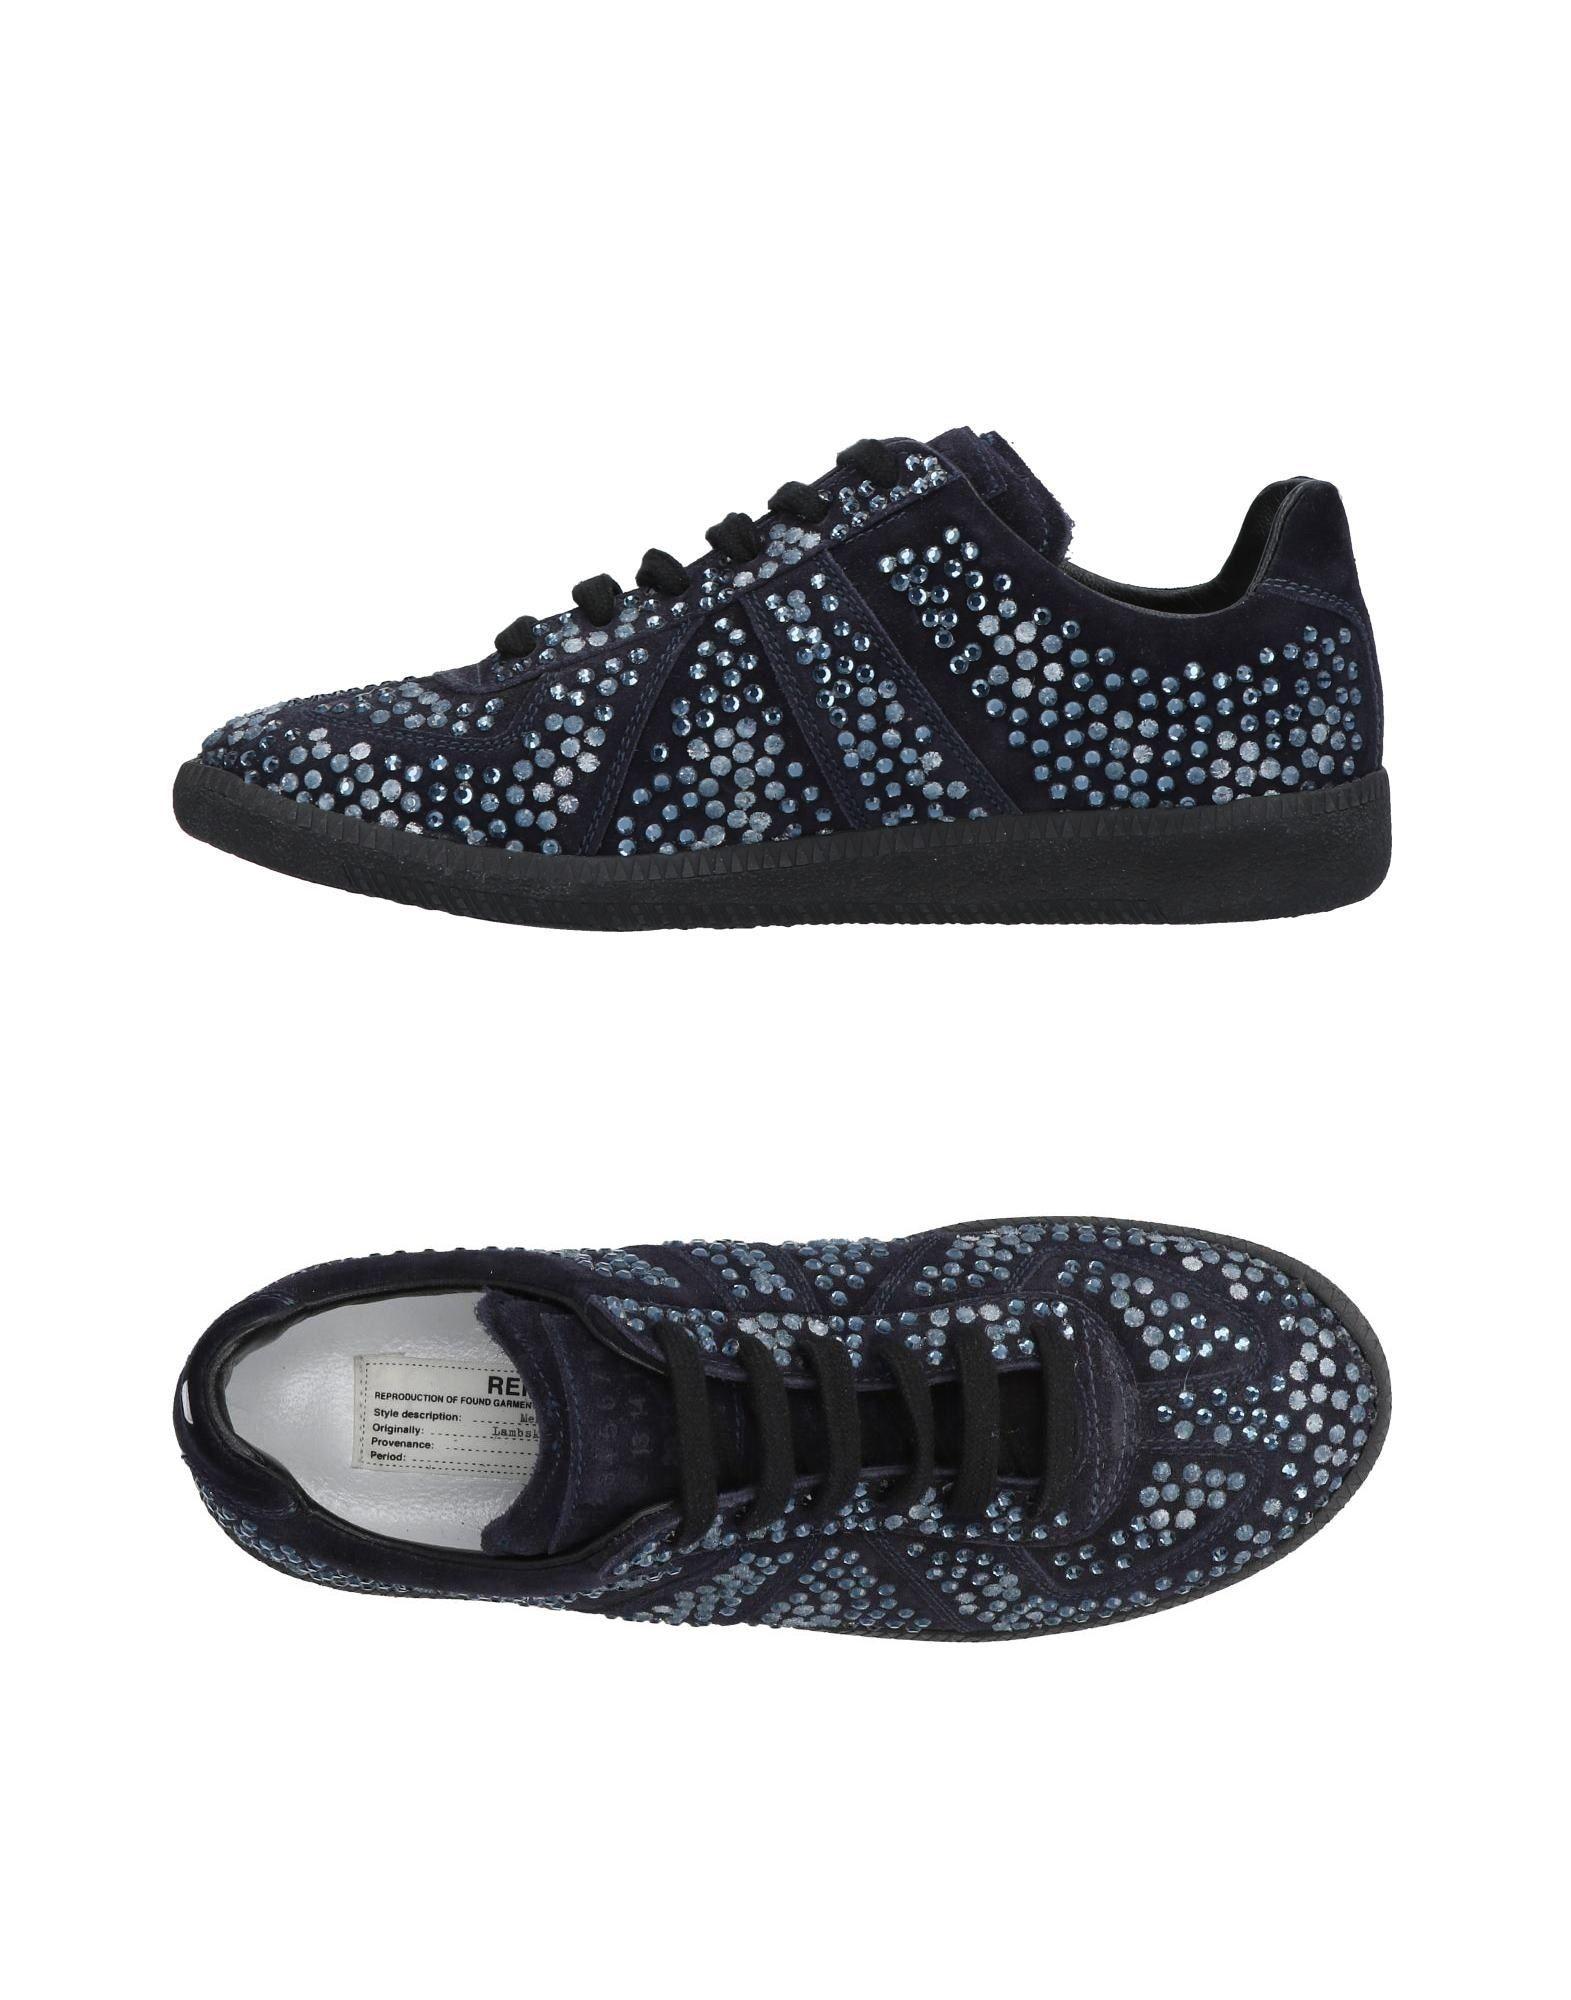 Maison Margiela Sneakers Damen  11276056ECGut aussehende strapazierfähige Schuhe